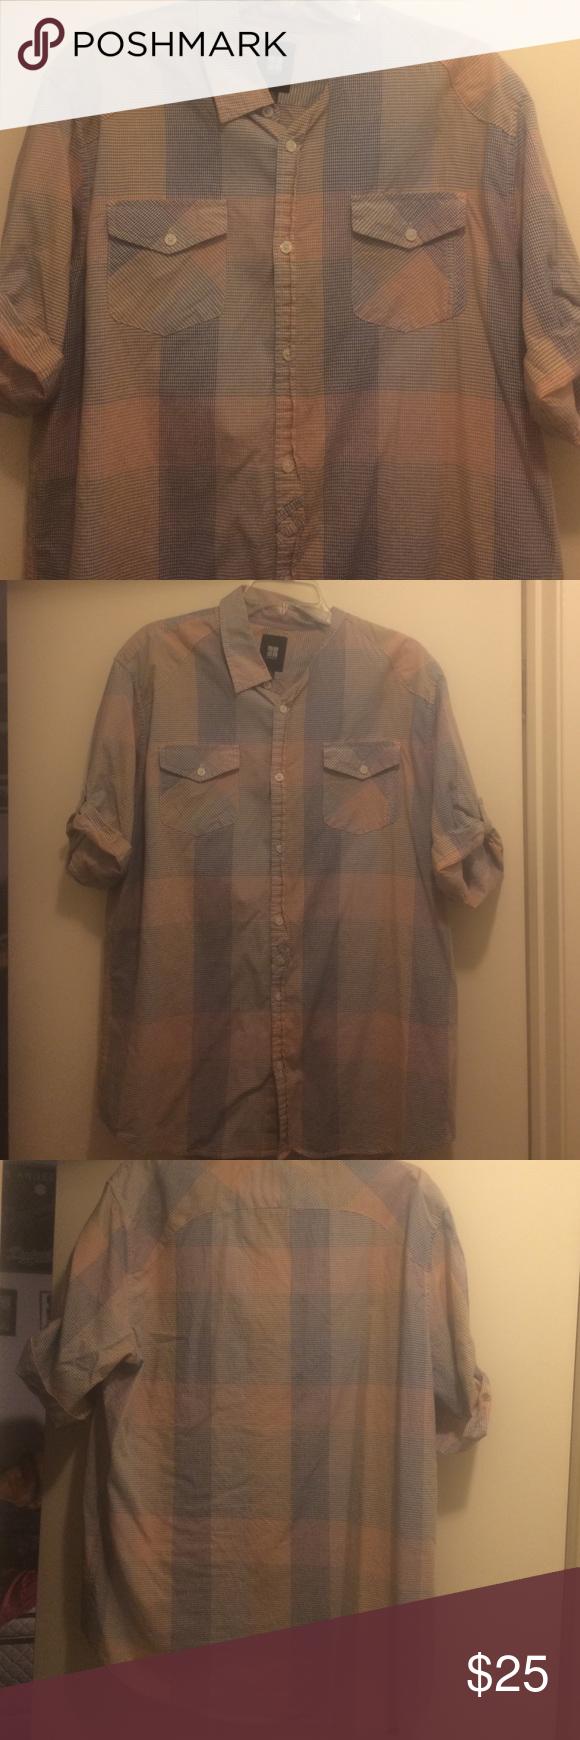 Casual pink dress shirt  Plaid shirt sleeve button down Pink and blue plaid button down short